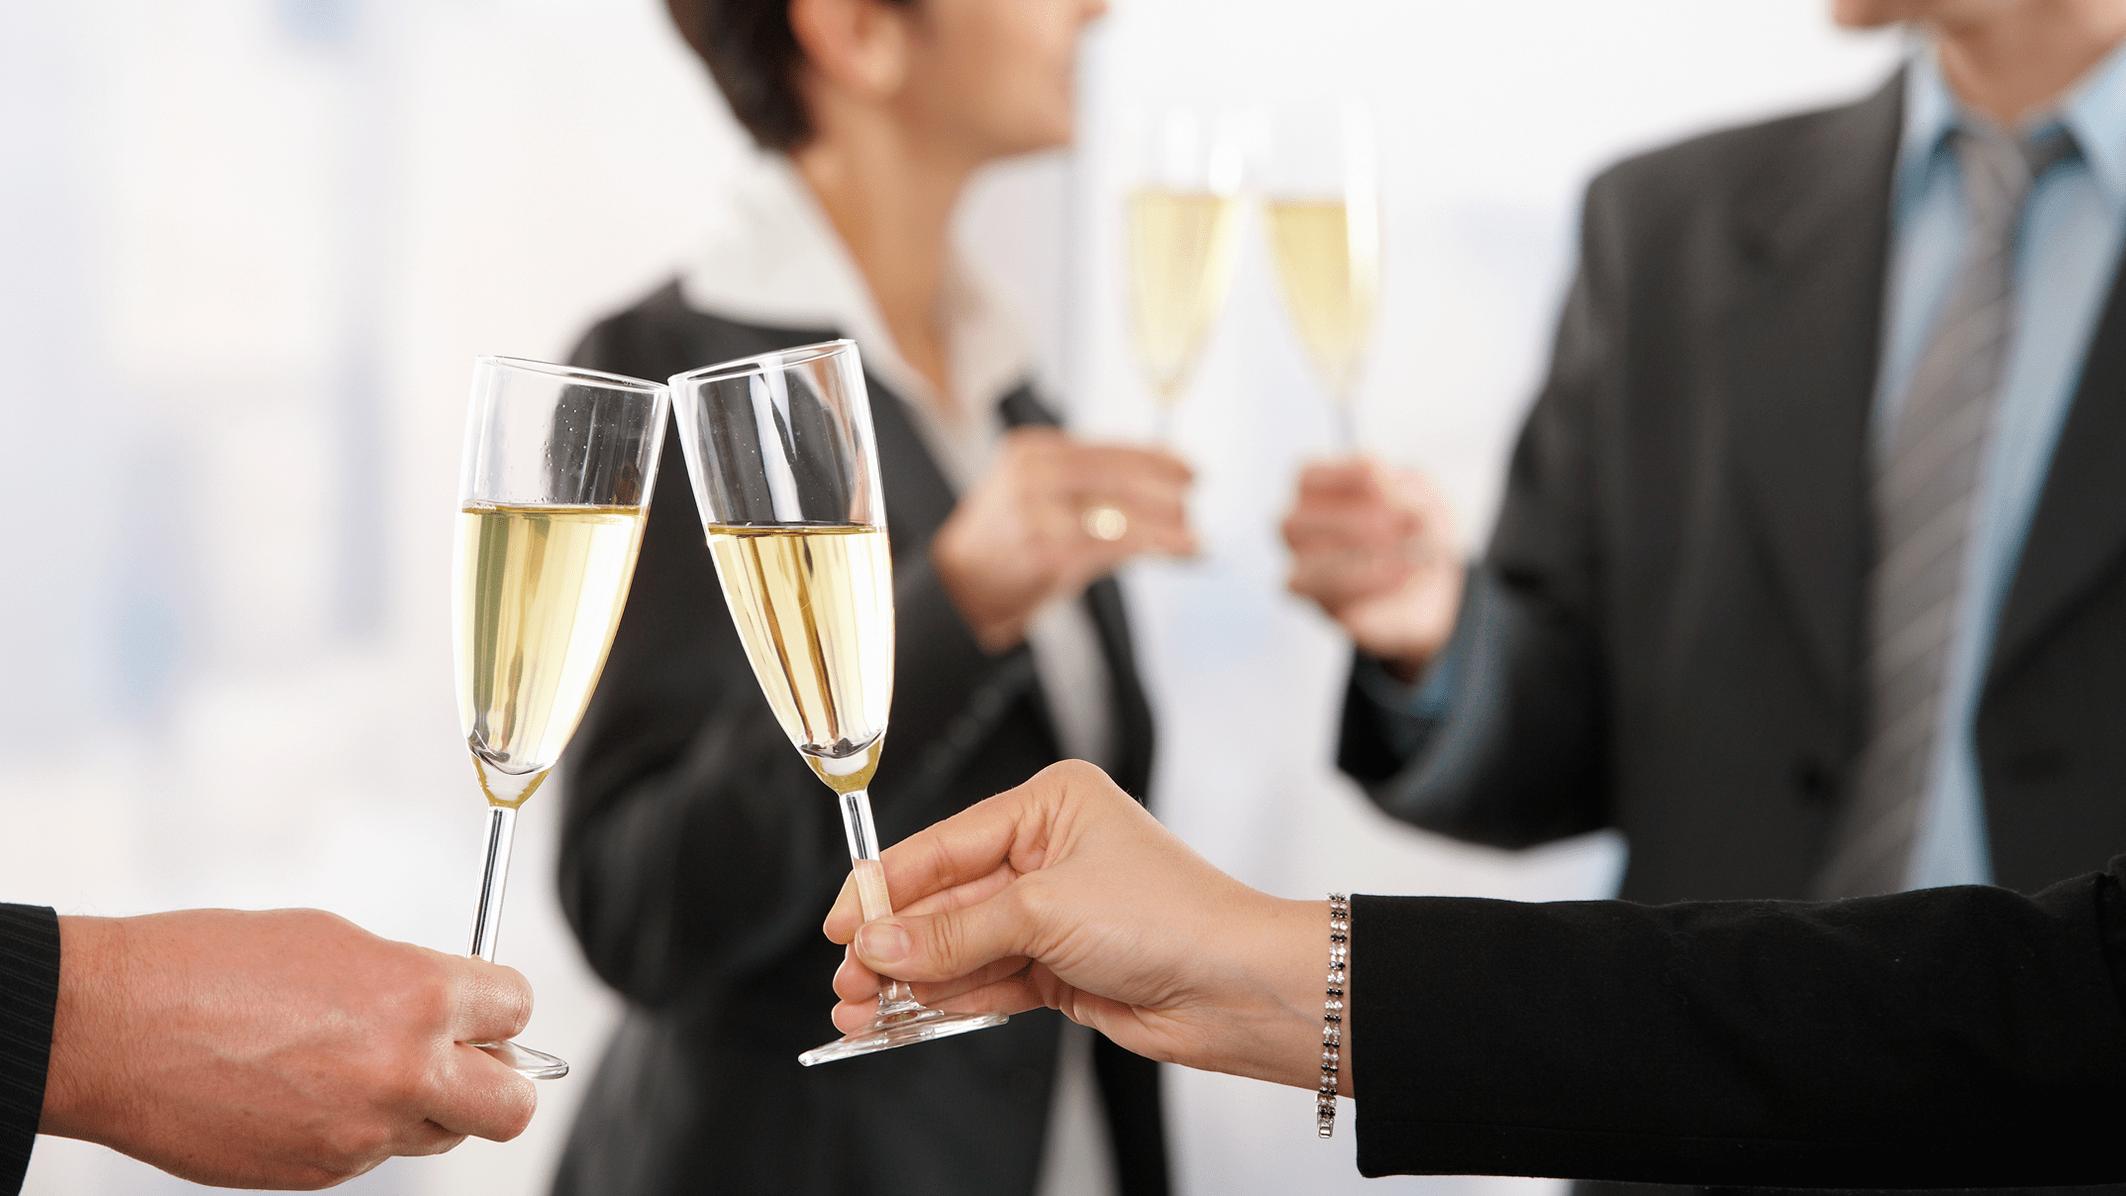 Como organizar facilmente a festa de final de ano da sua empresa